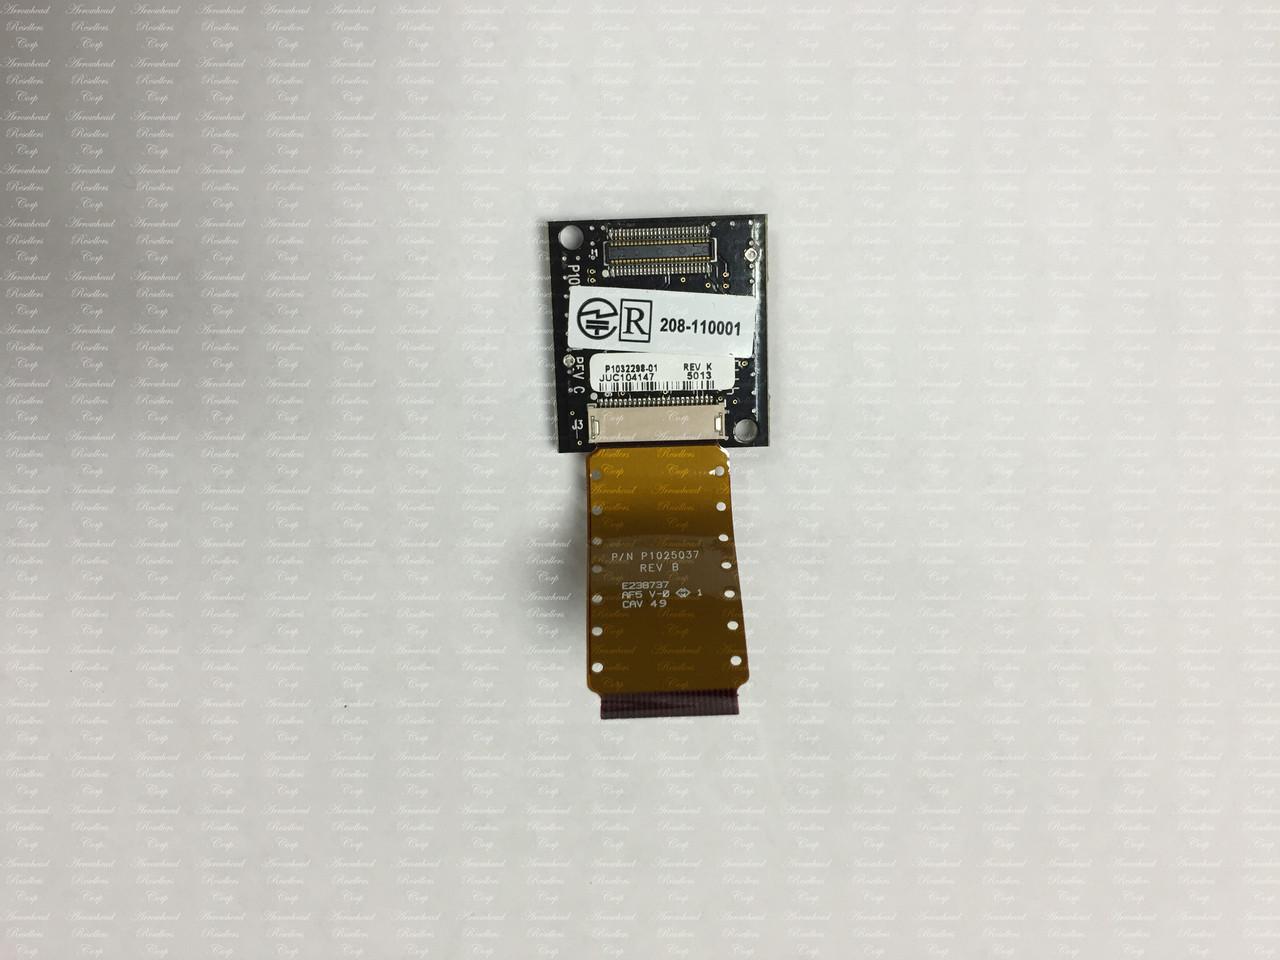 Dual Radio (Bluetooth and WiFi) for QLn320   P1032298-01